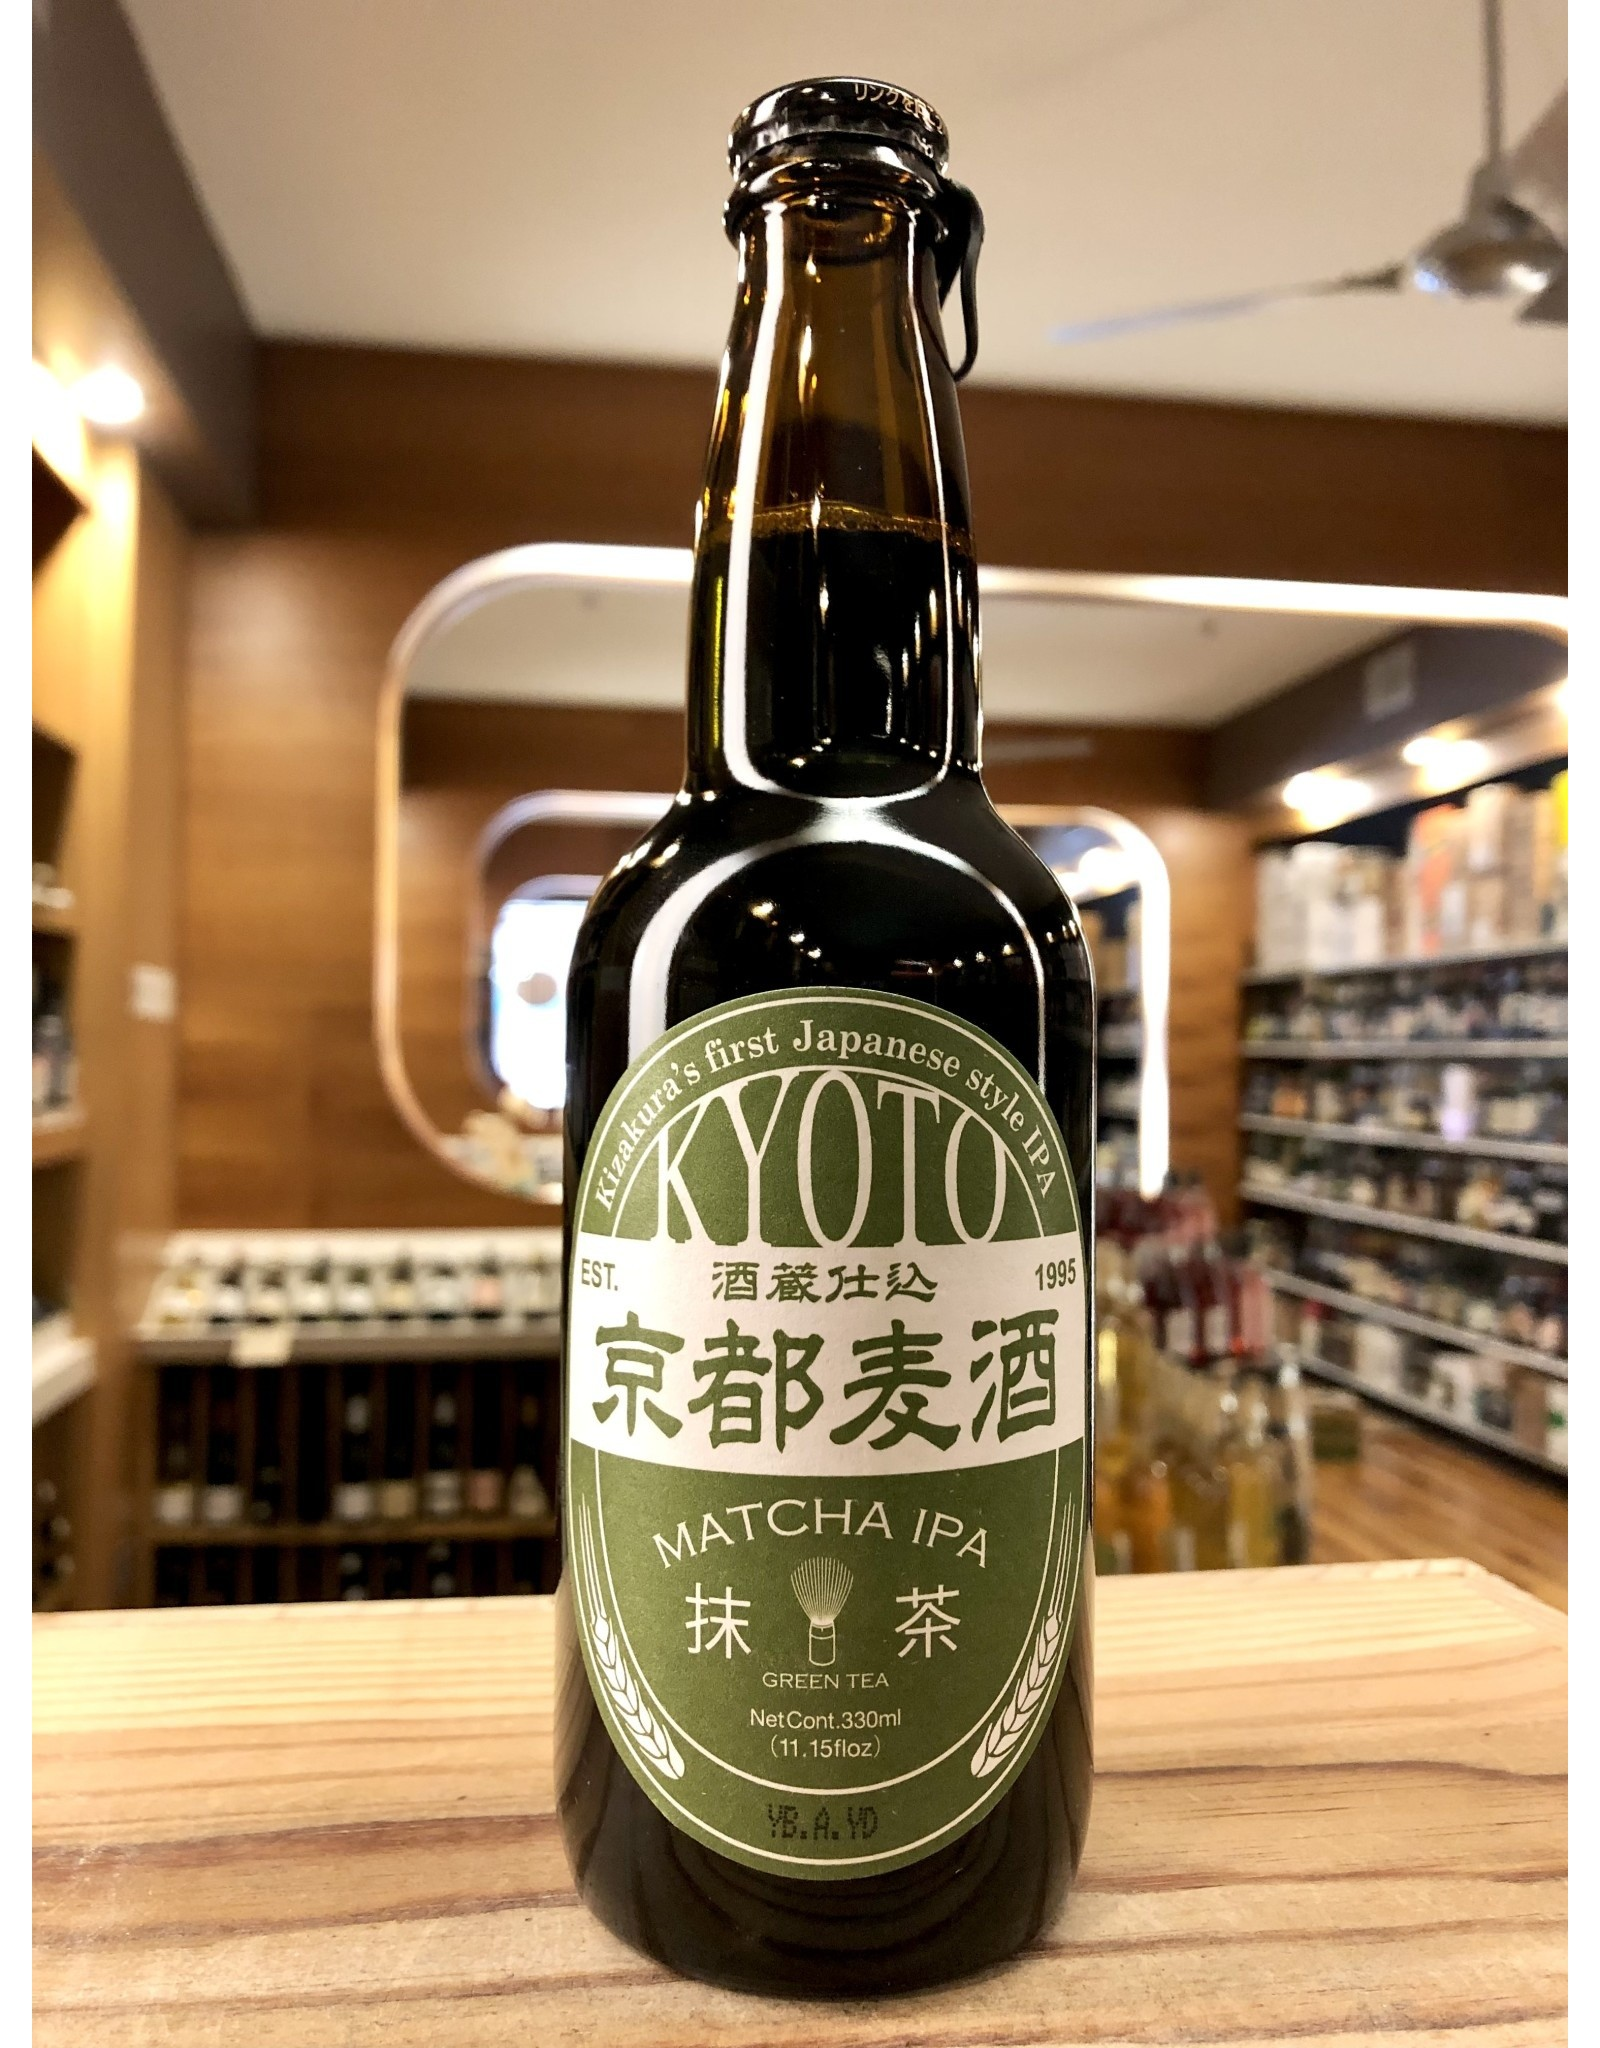 Kizakura Kyoto Matcha IPA - 330 ML